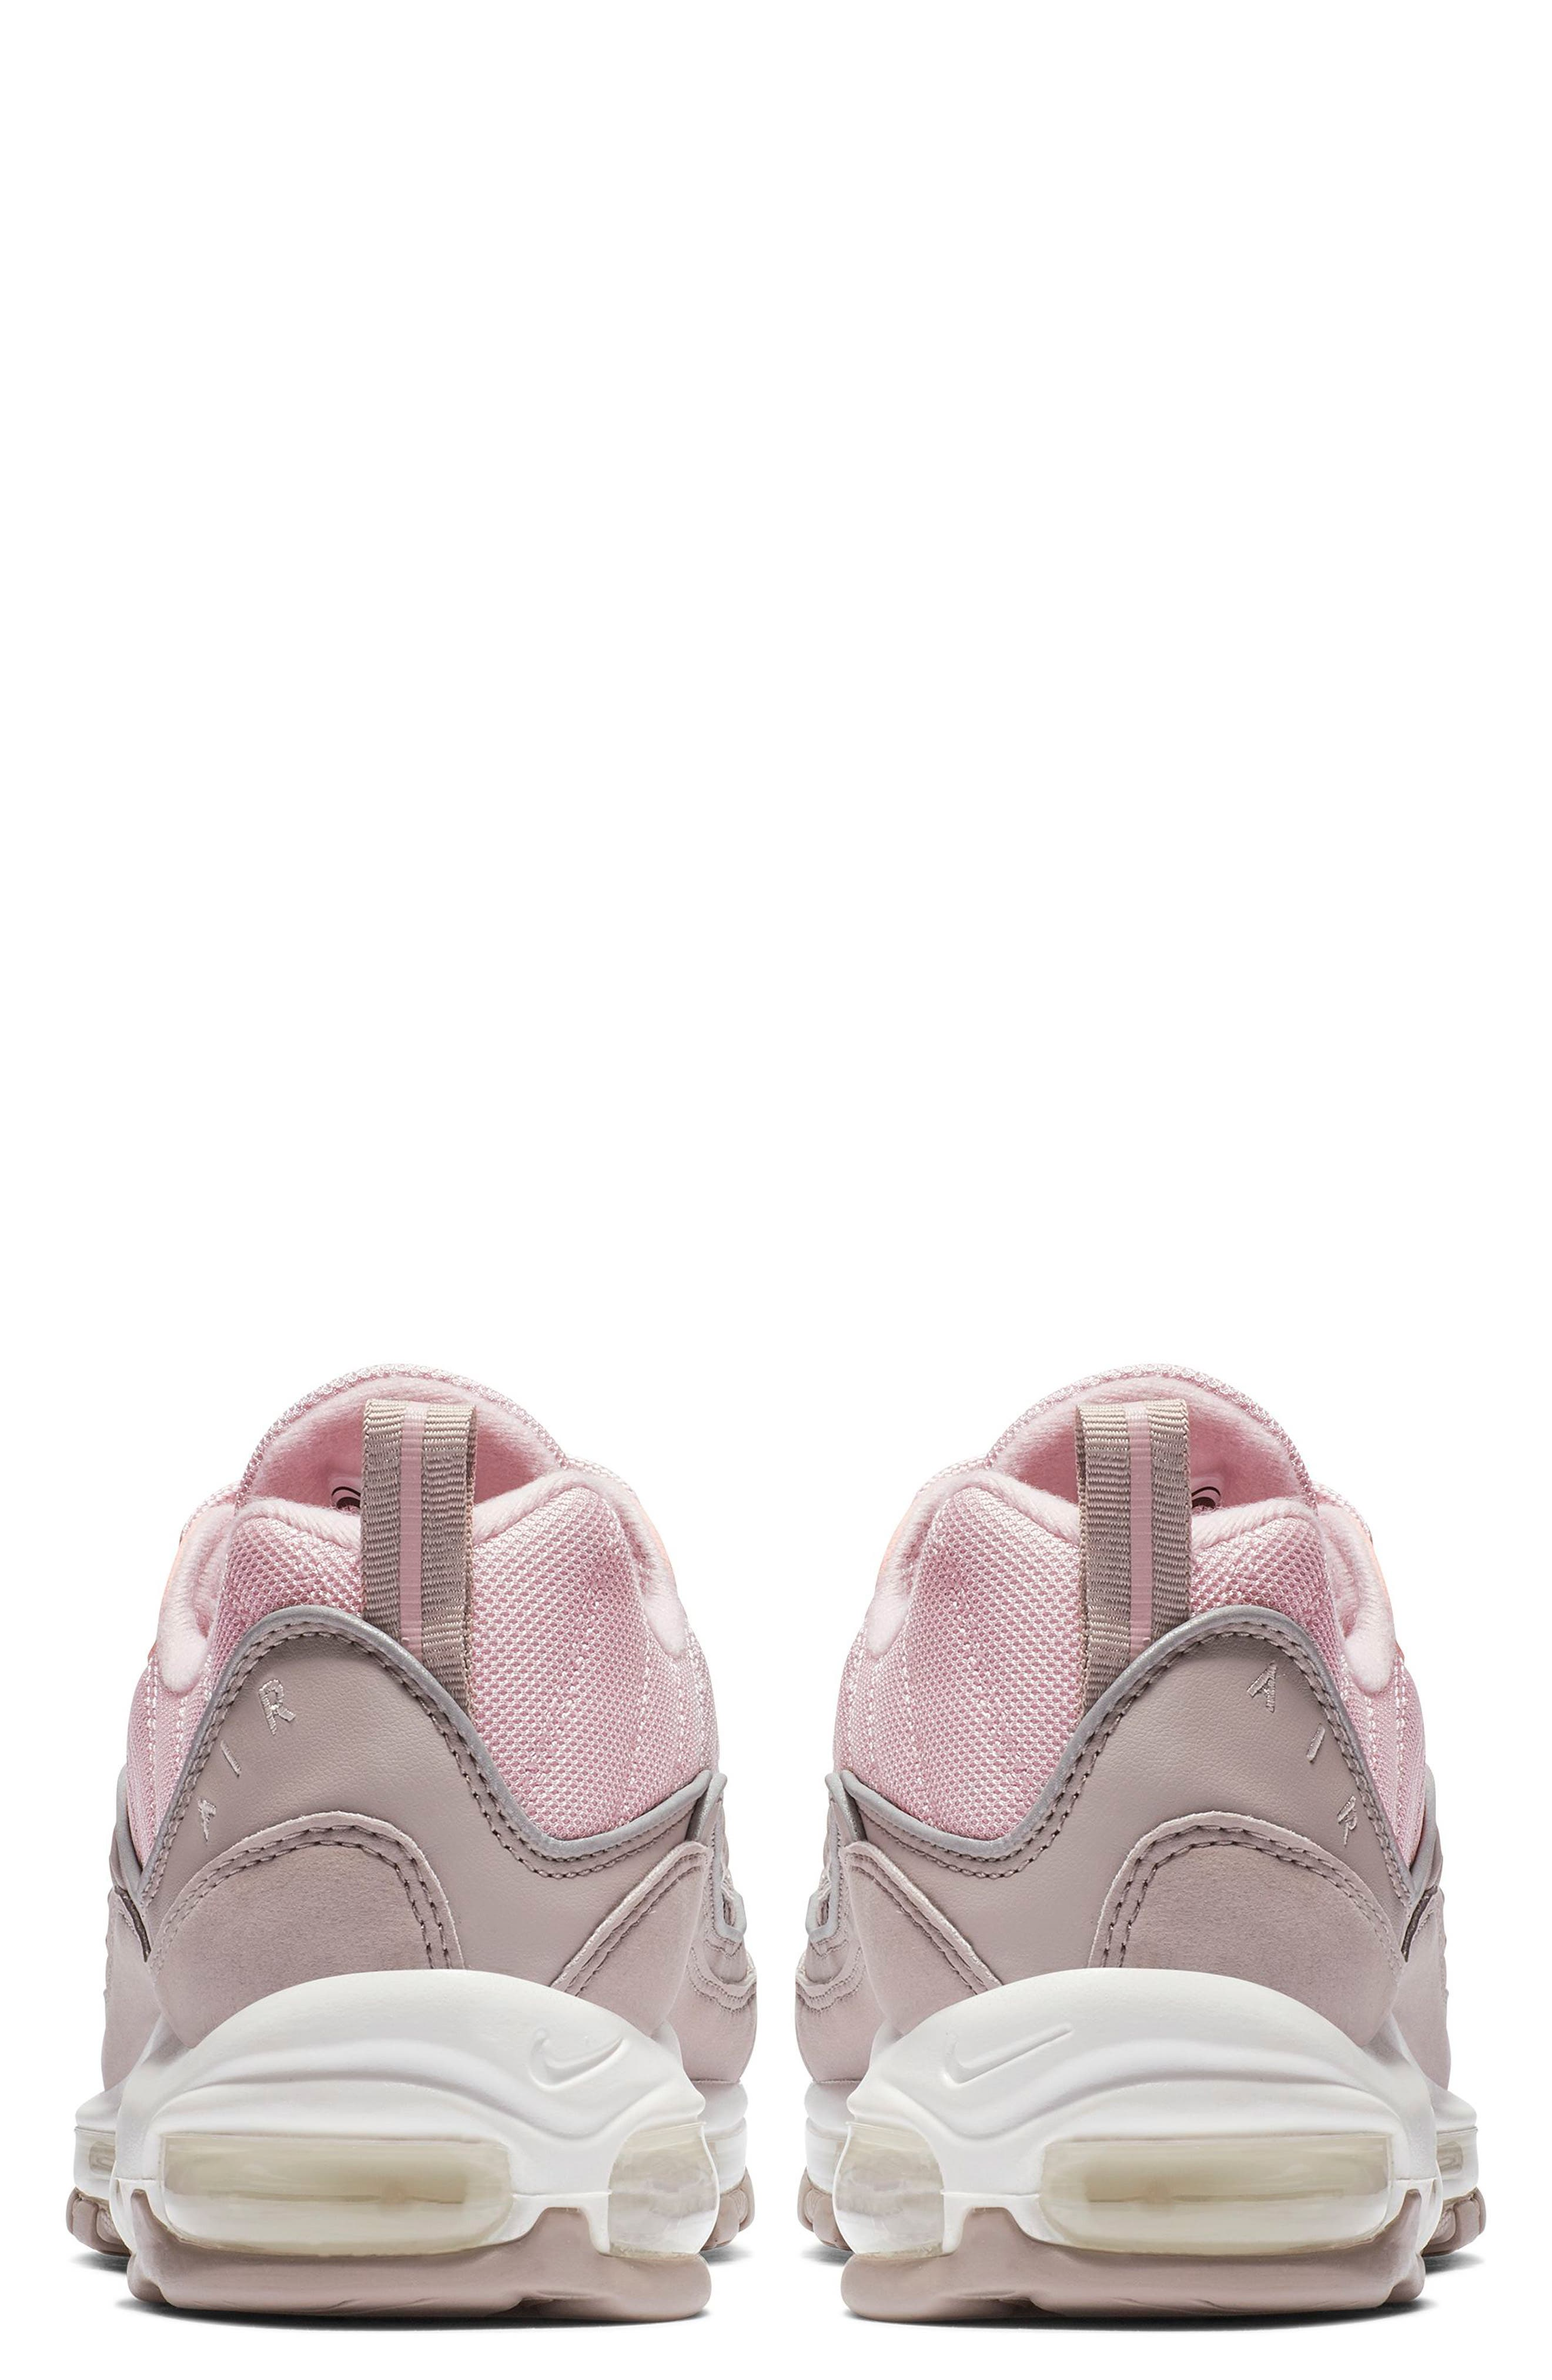 Air Max 98 Sneaker,                             Alternate thumbnail 2, color,                             PUMICE/ PLUM CHALK/ WHITE